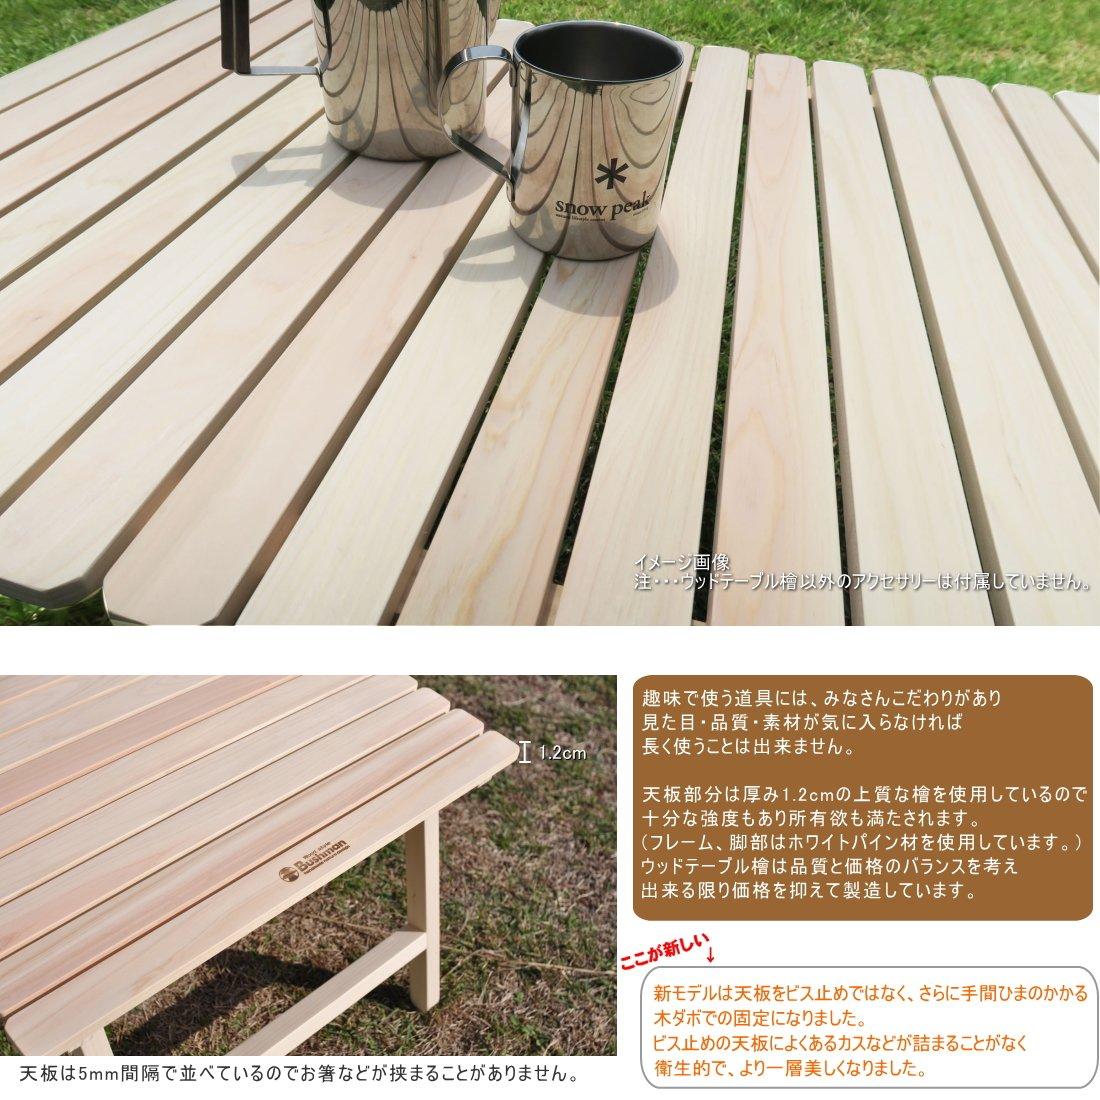 amazon アウトドア ウッドテーブル檜 l wood style bushman テーブル